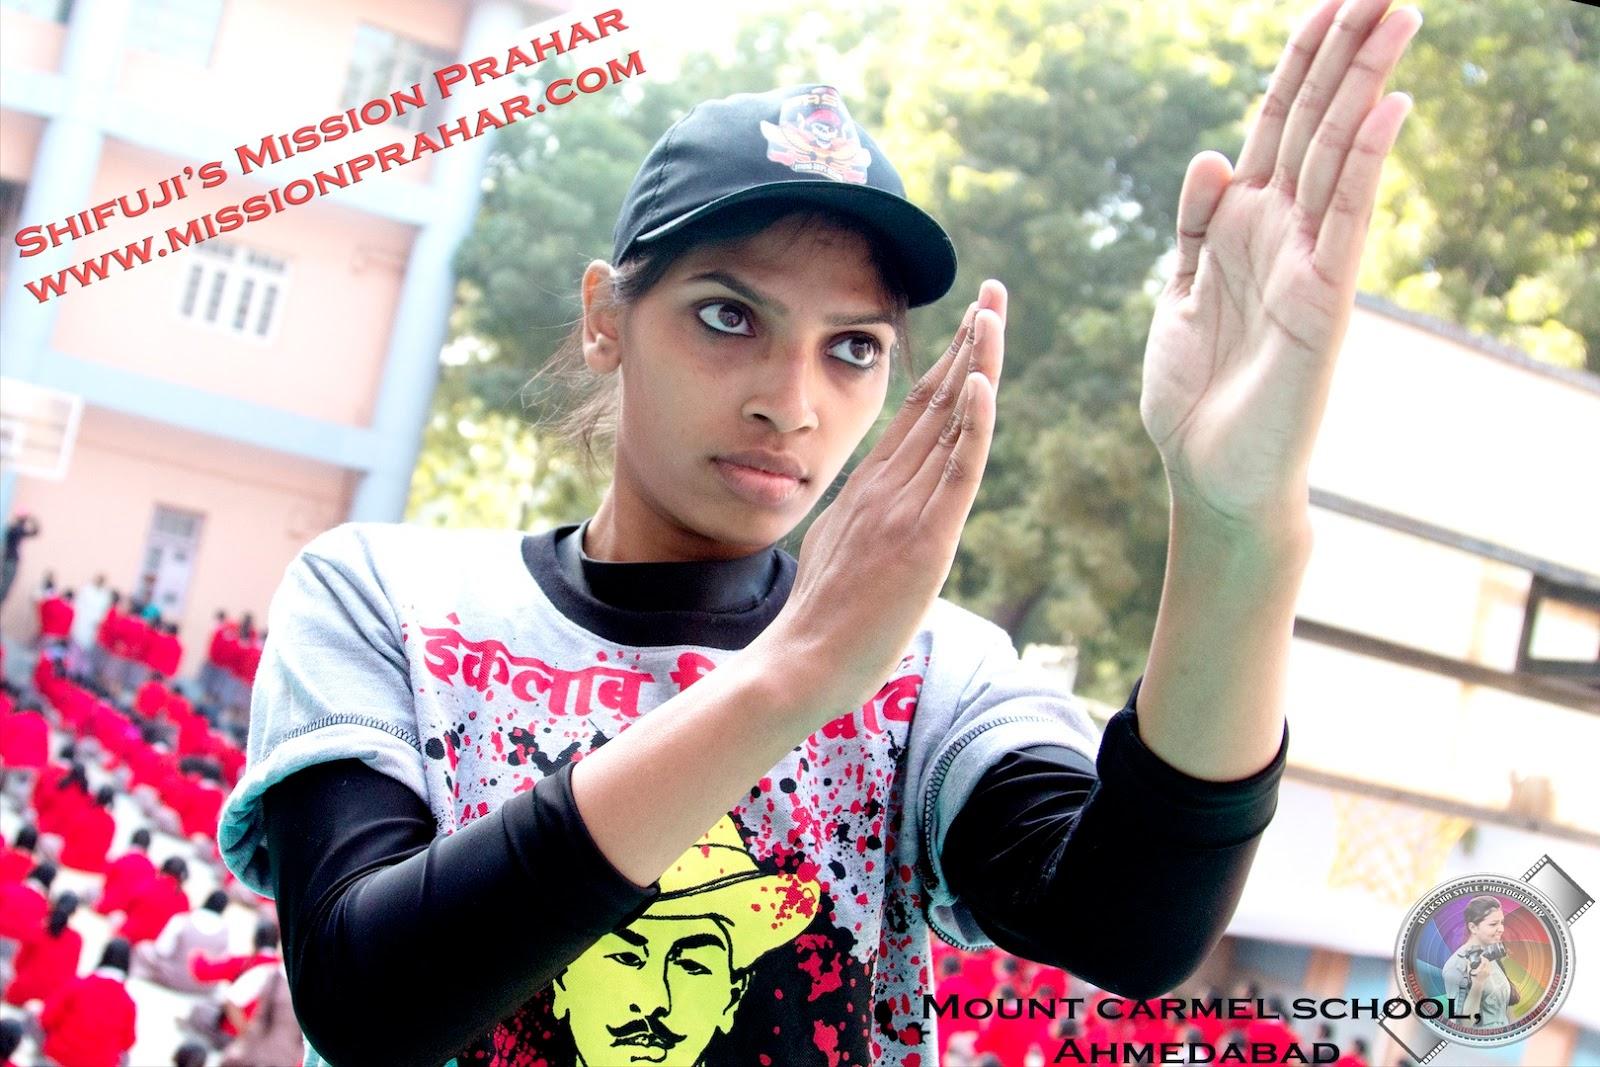 sexy mumbai girl fuckingman free vidio